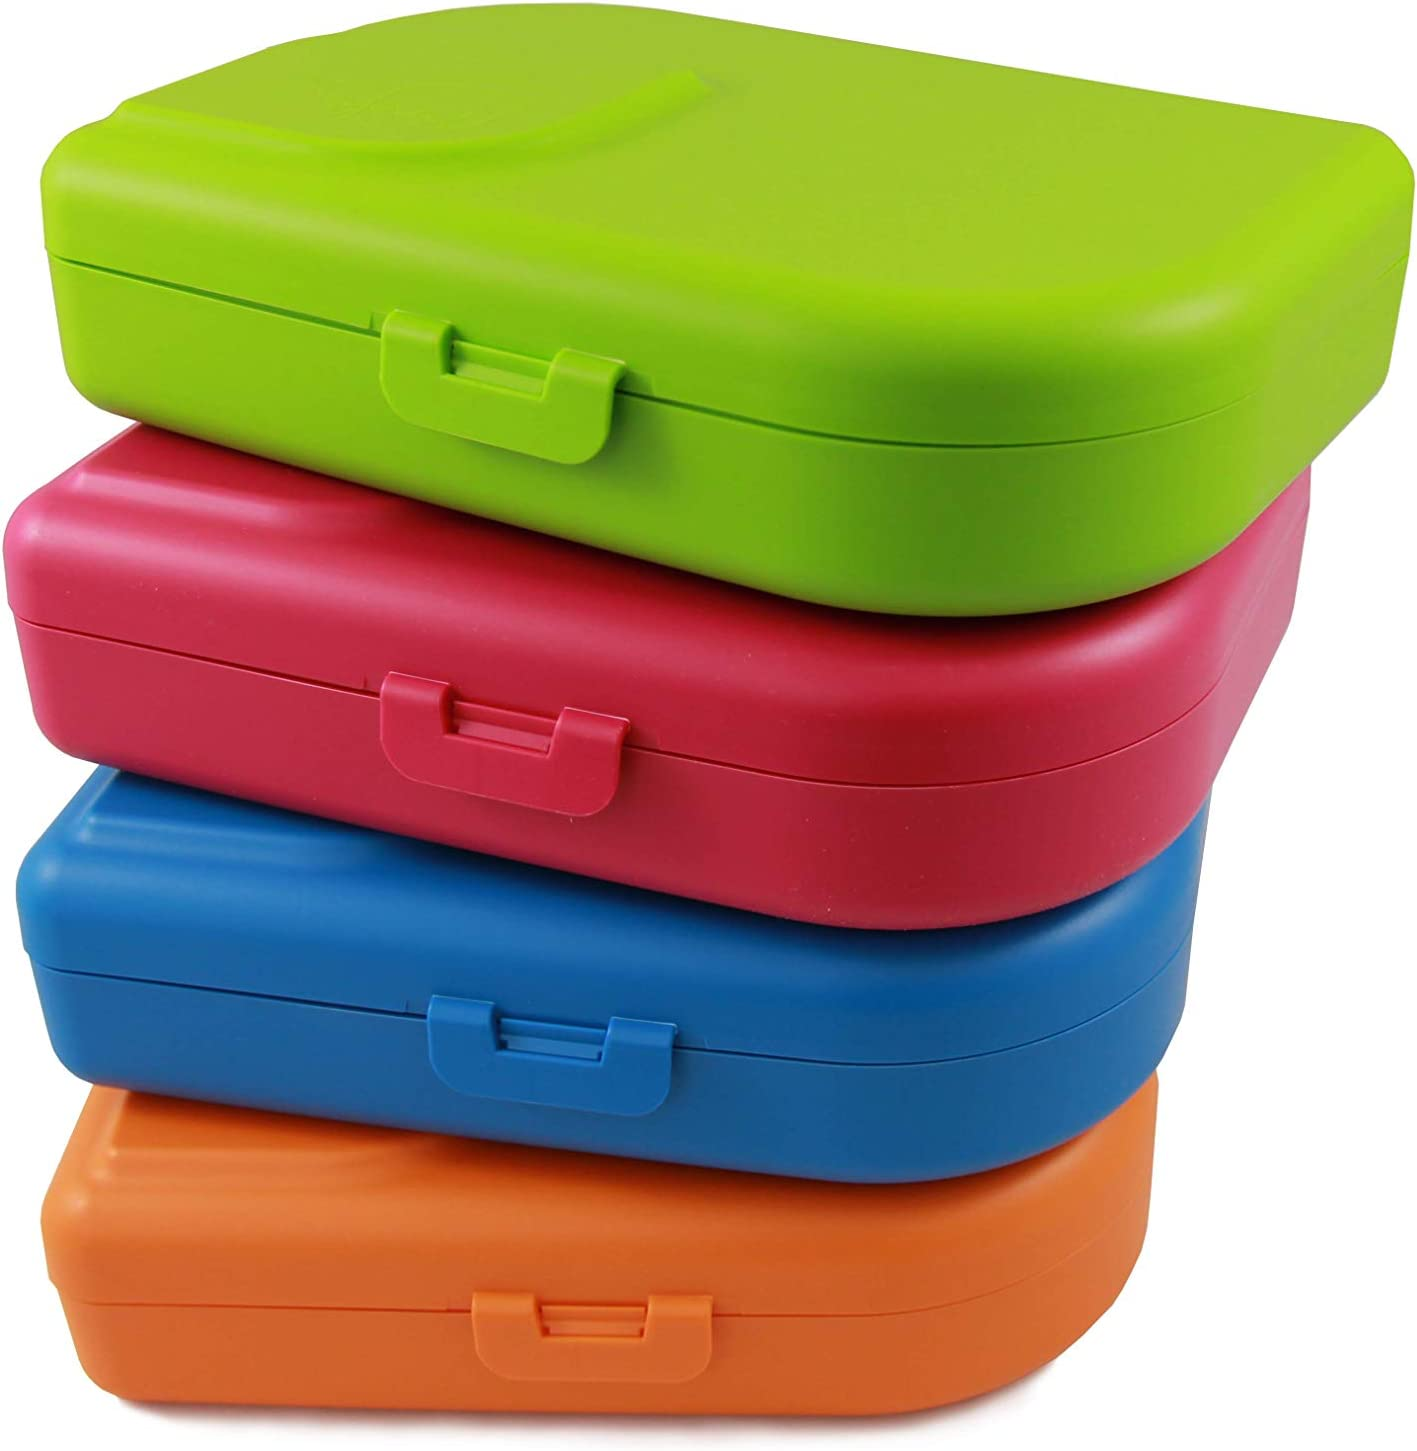 ajaa 18,5 x 13 x 5 cm Lunch Box Lime